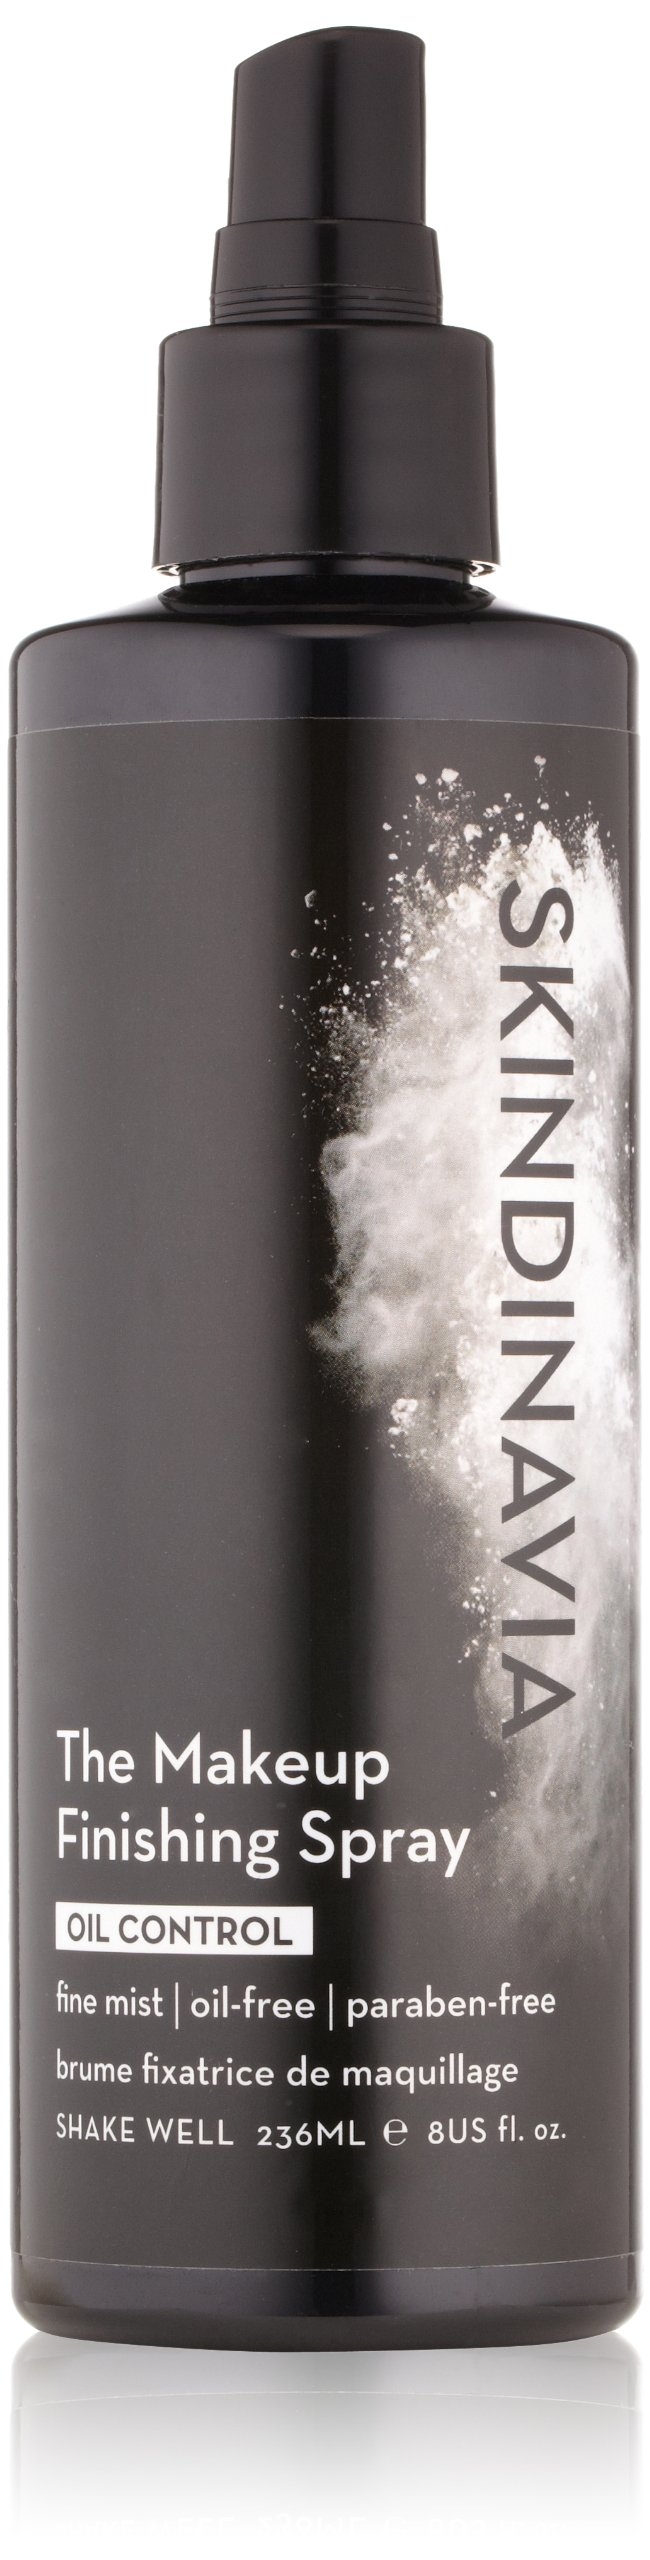 Skindinavia The Makeup Oil Control Finishing Spray, 8 Fluid Ounce